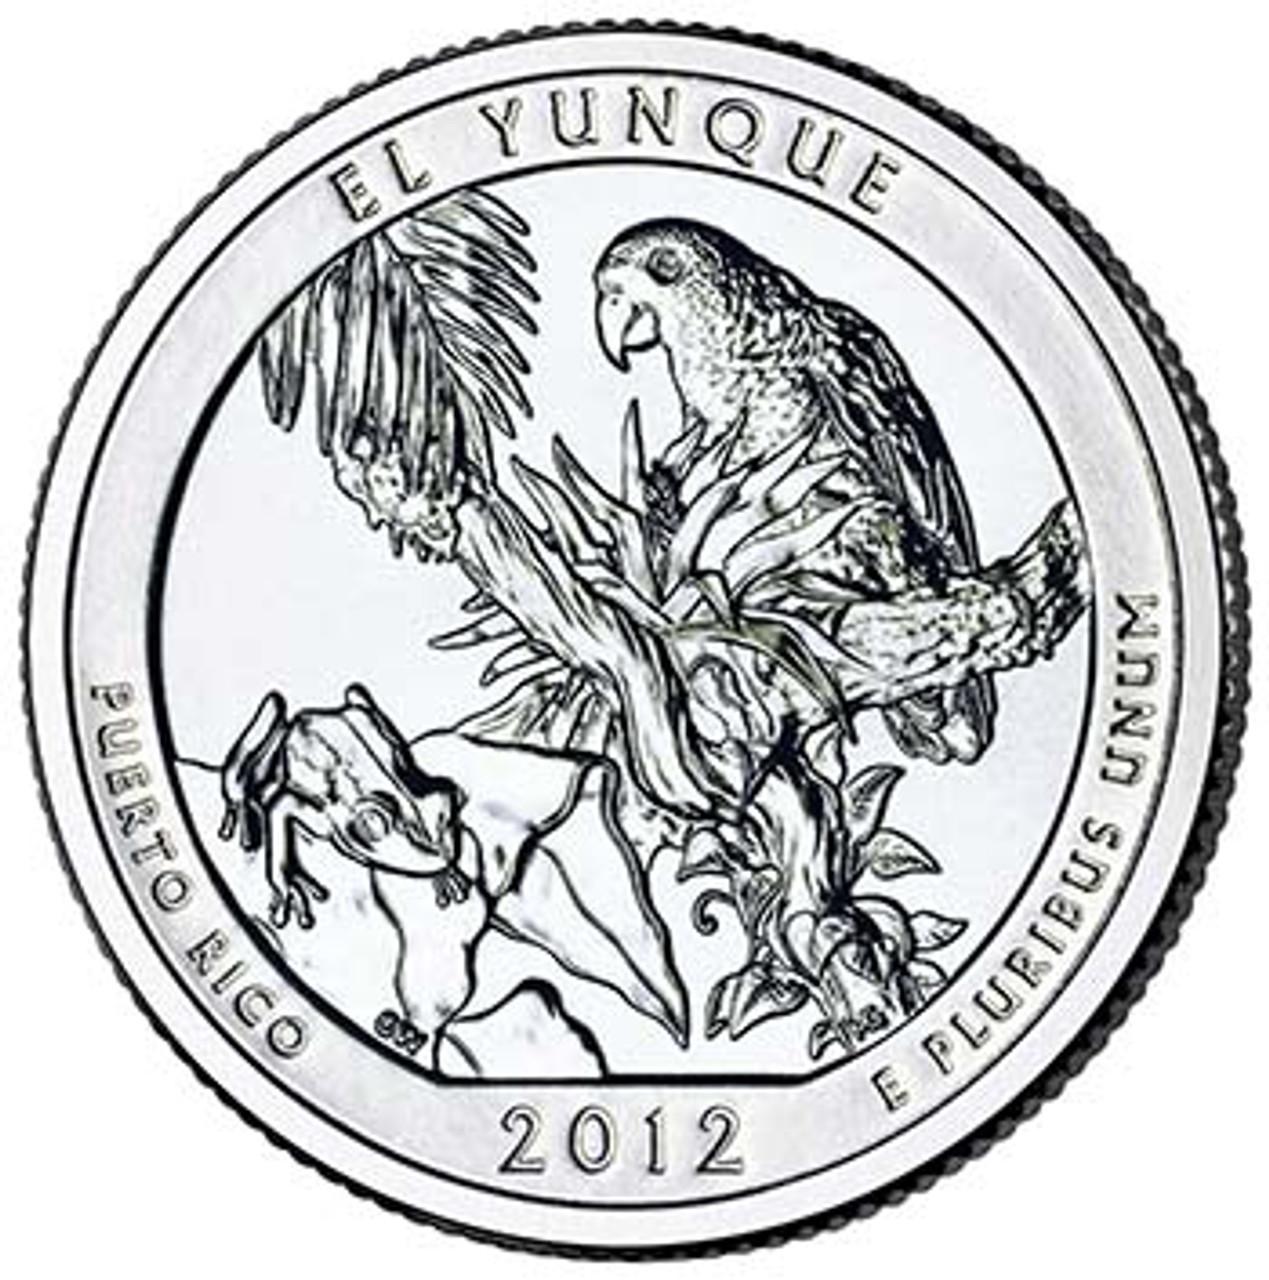 2012-D El Yunque National Forest Quarter Brilliant Uncirculated Image 1